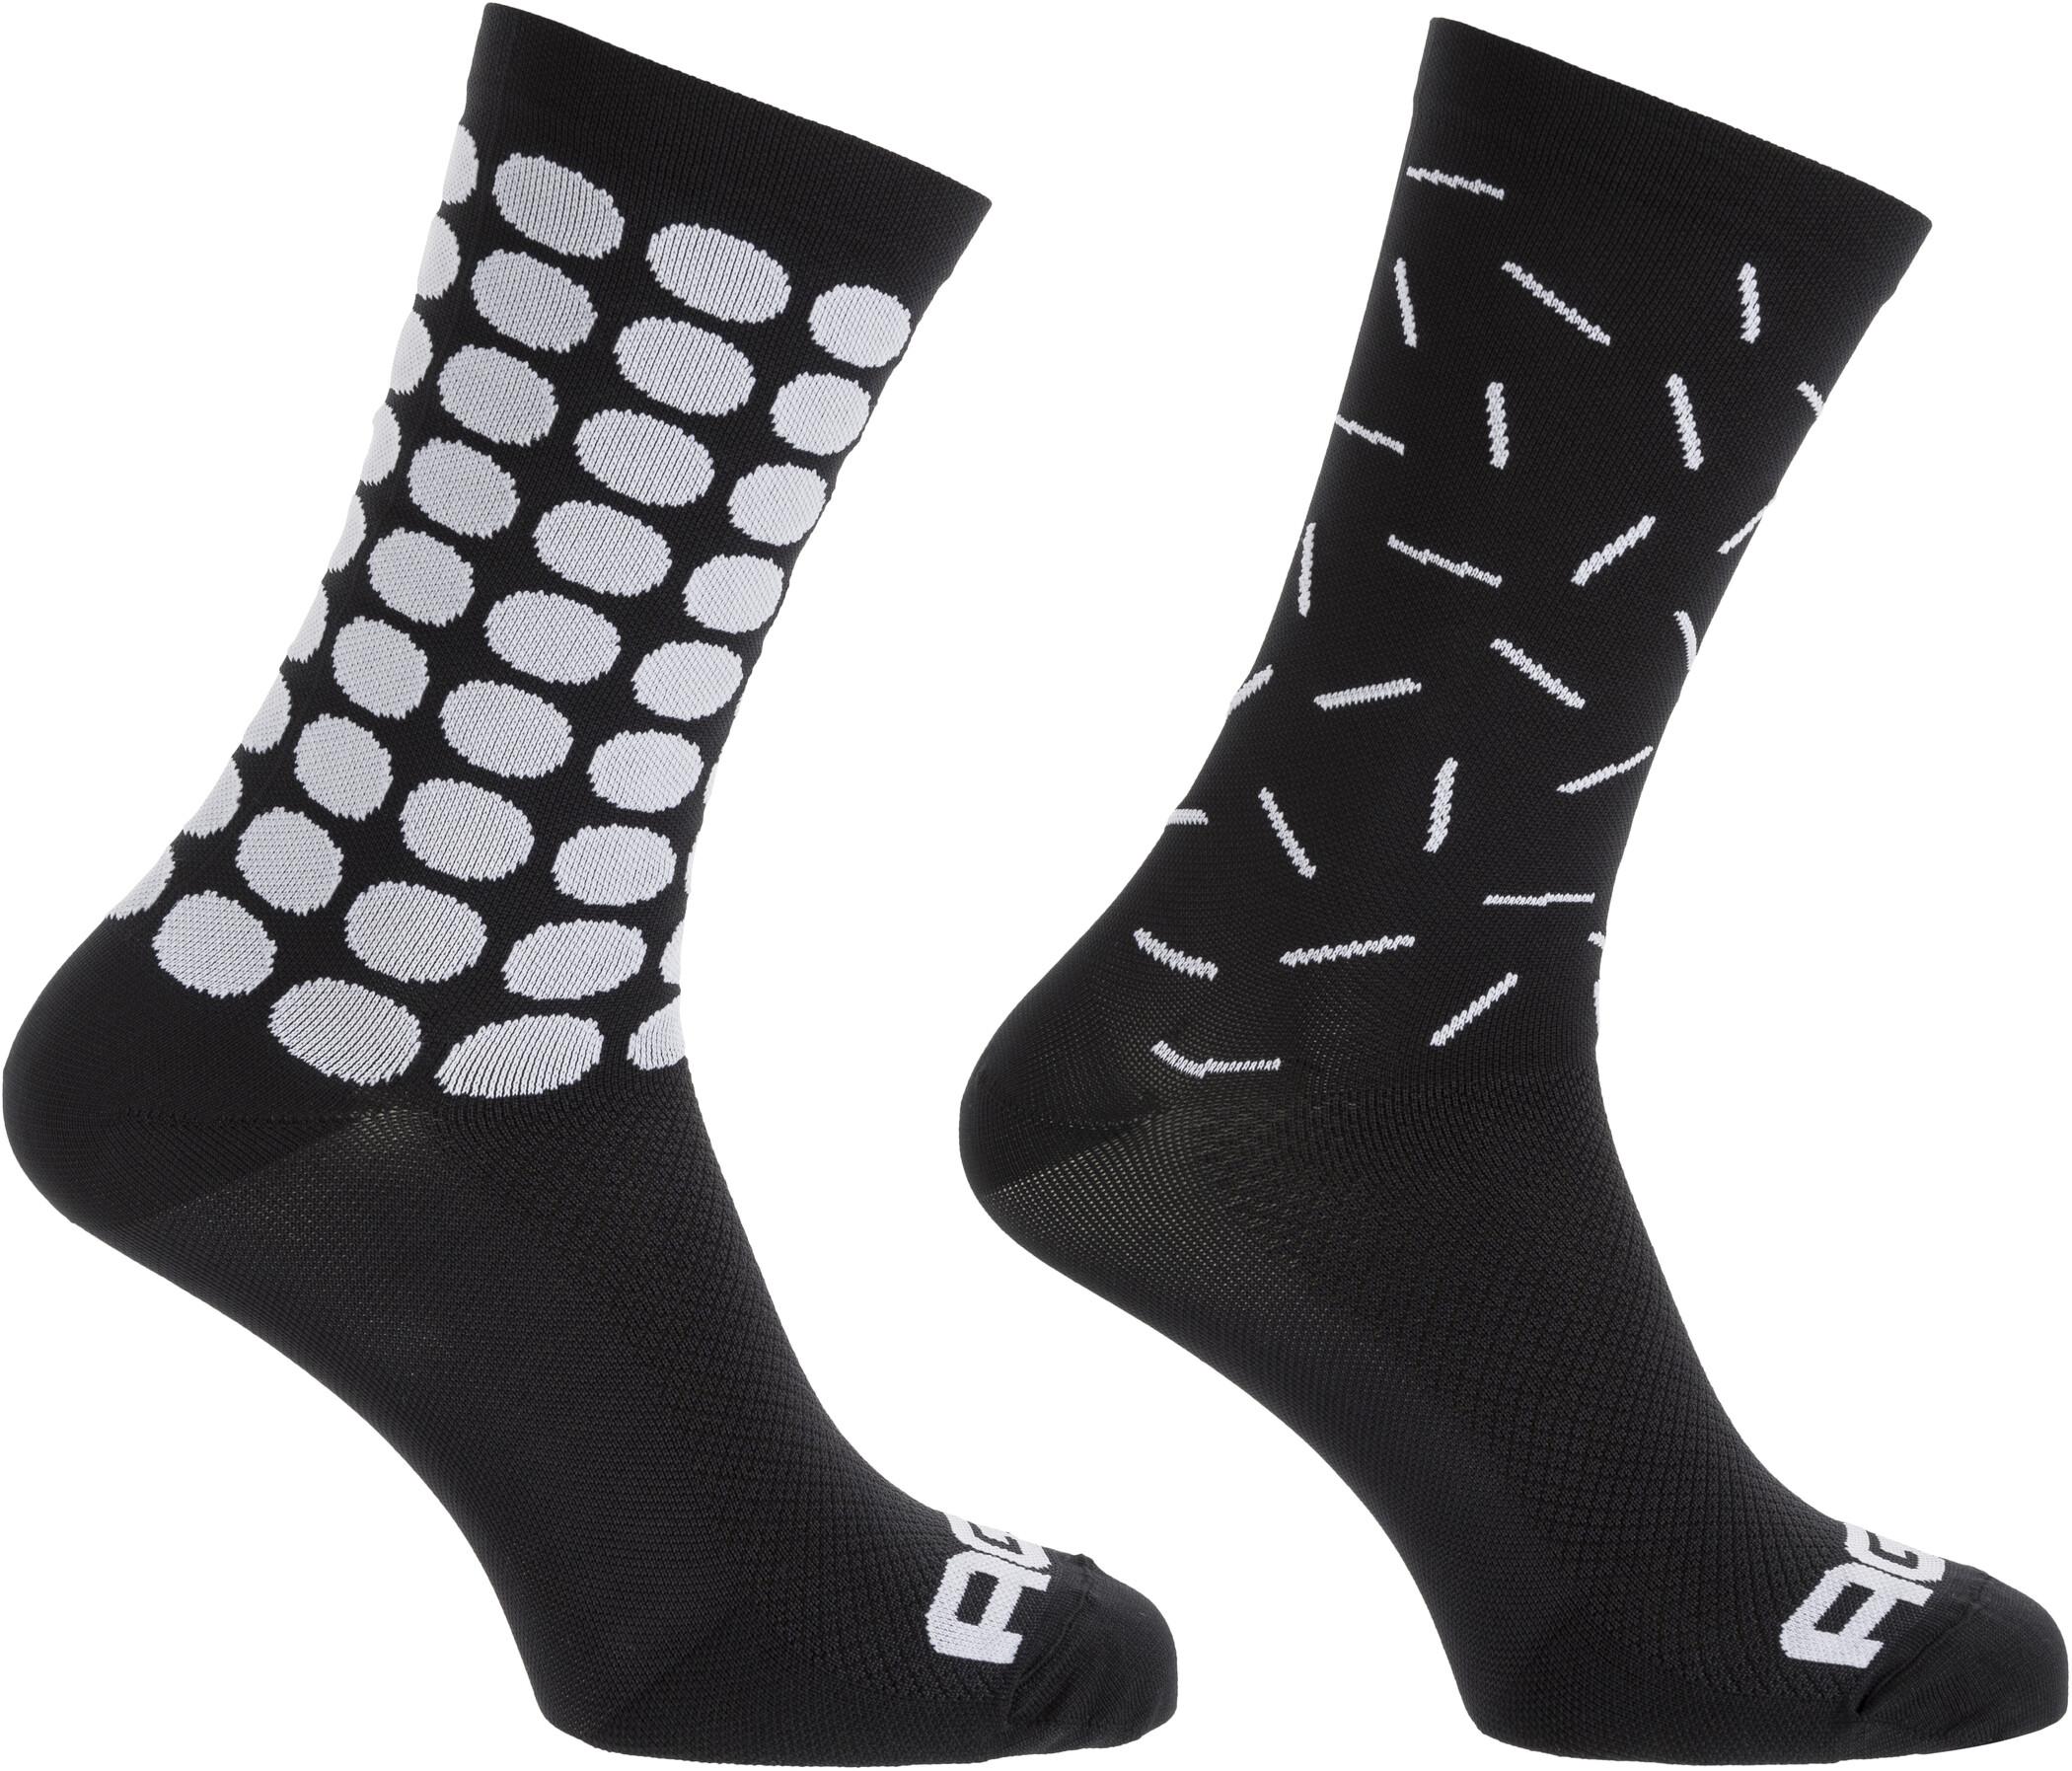 AGU Essential Sprinkle Strømper, black (2019) | Socks